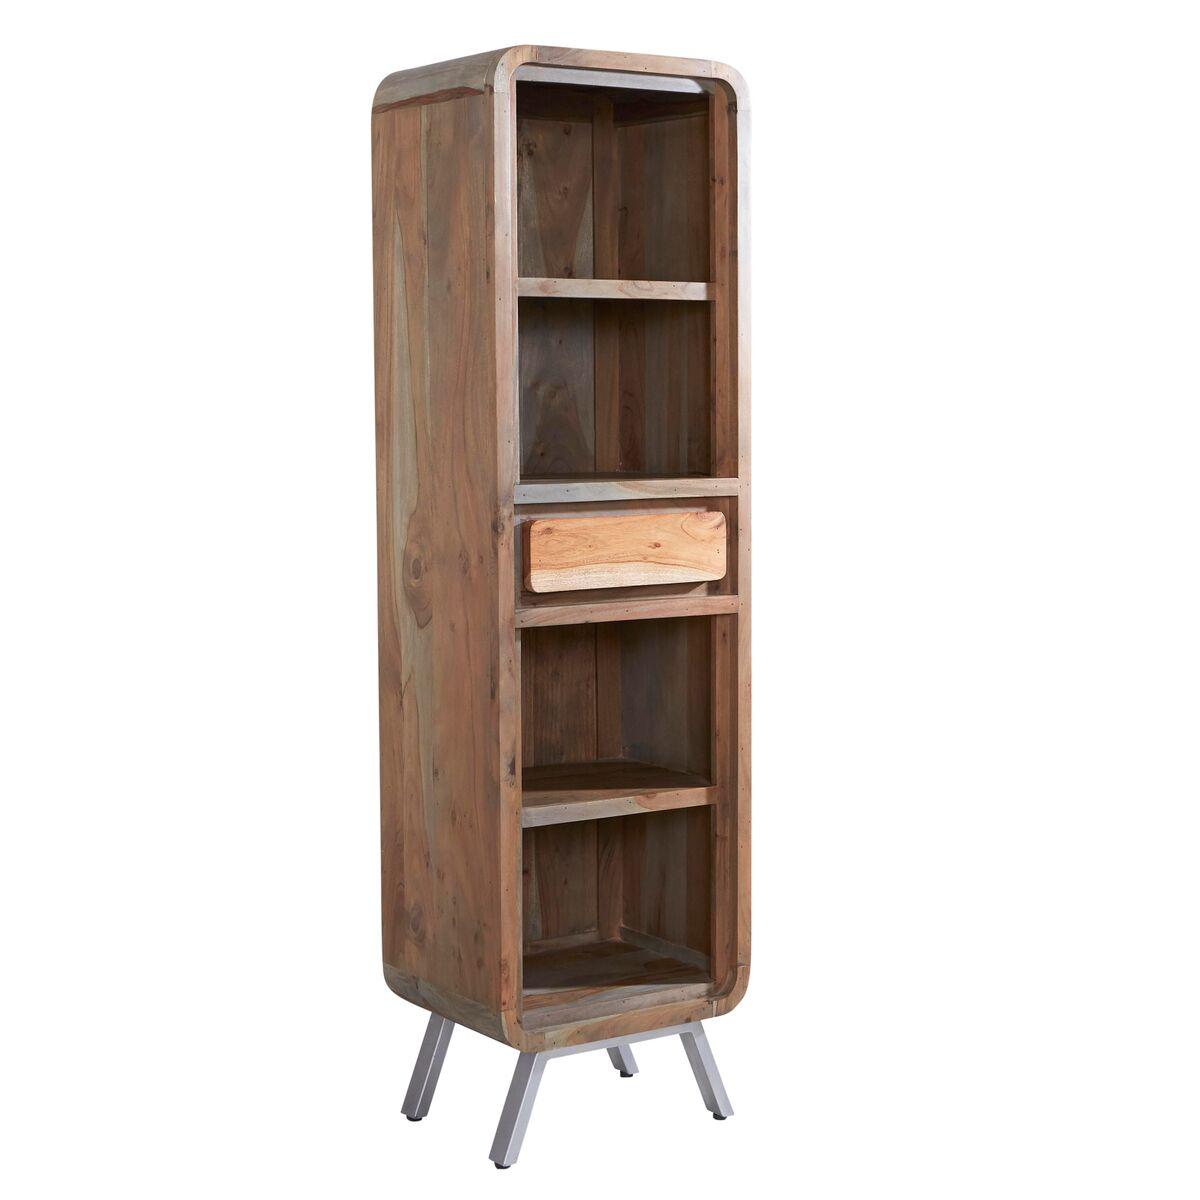 Aspen Iron/Wooden - Narrow Bookcase